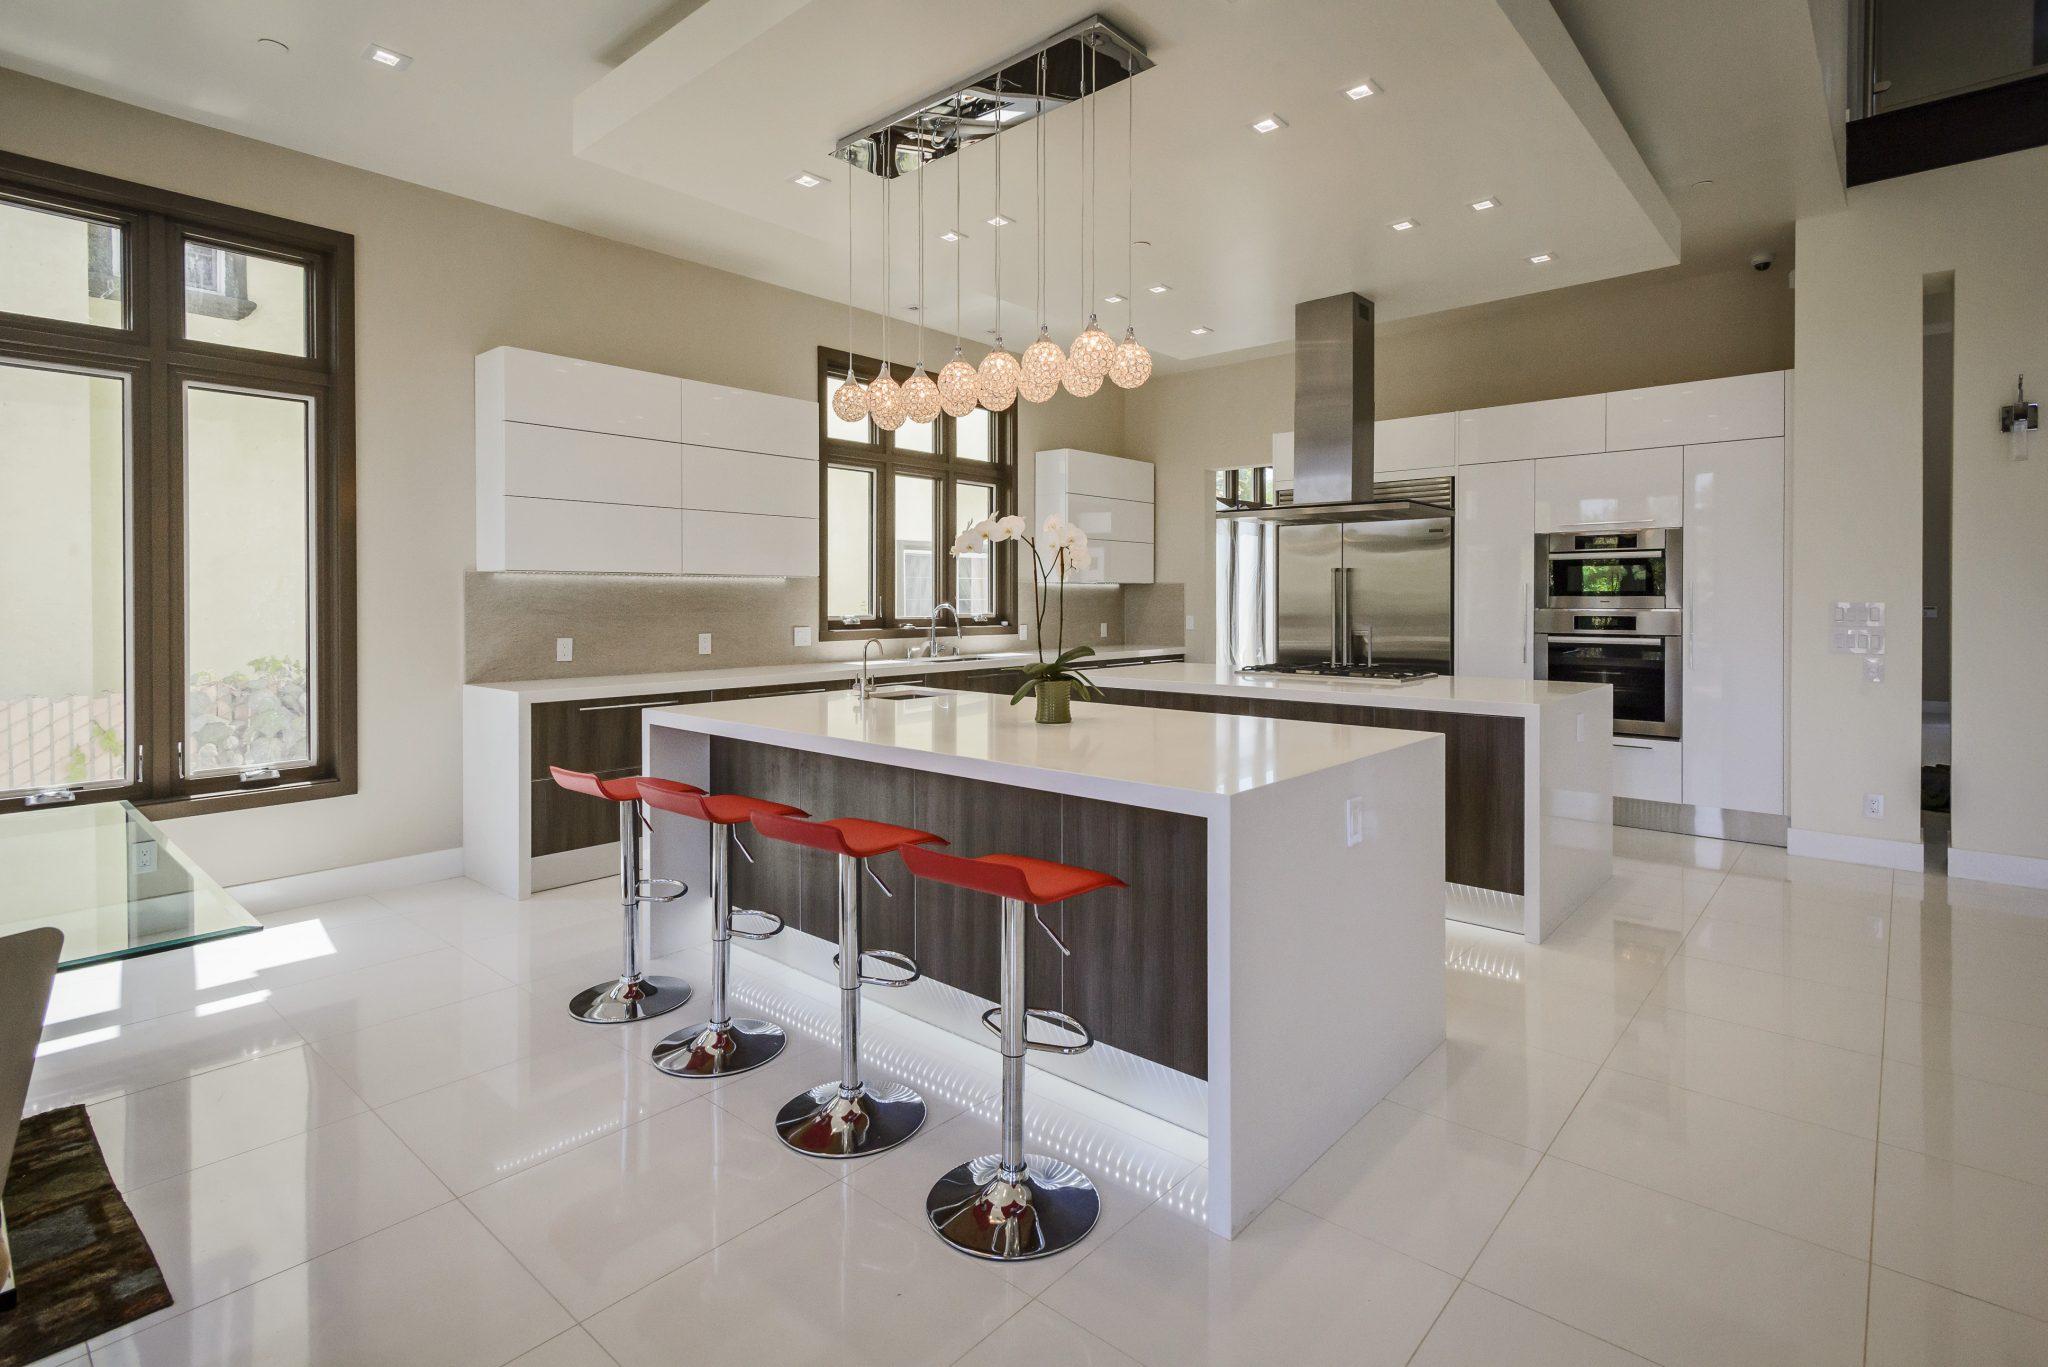 European Kitchen Cabinets  European Cabinets  Design Studios